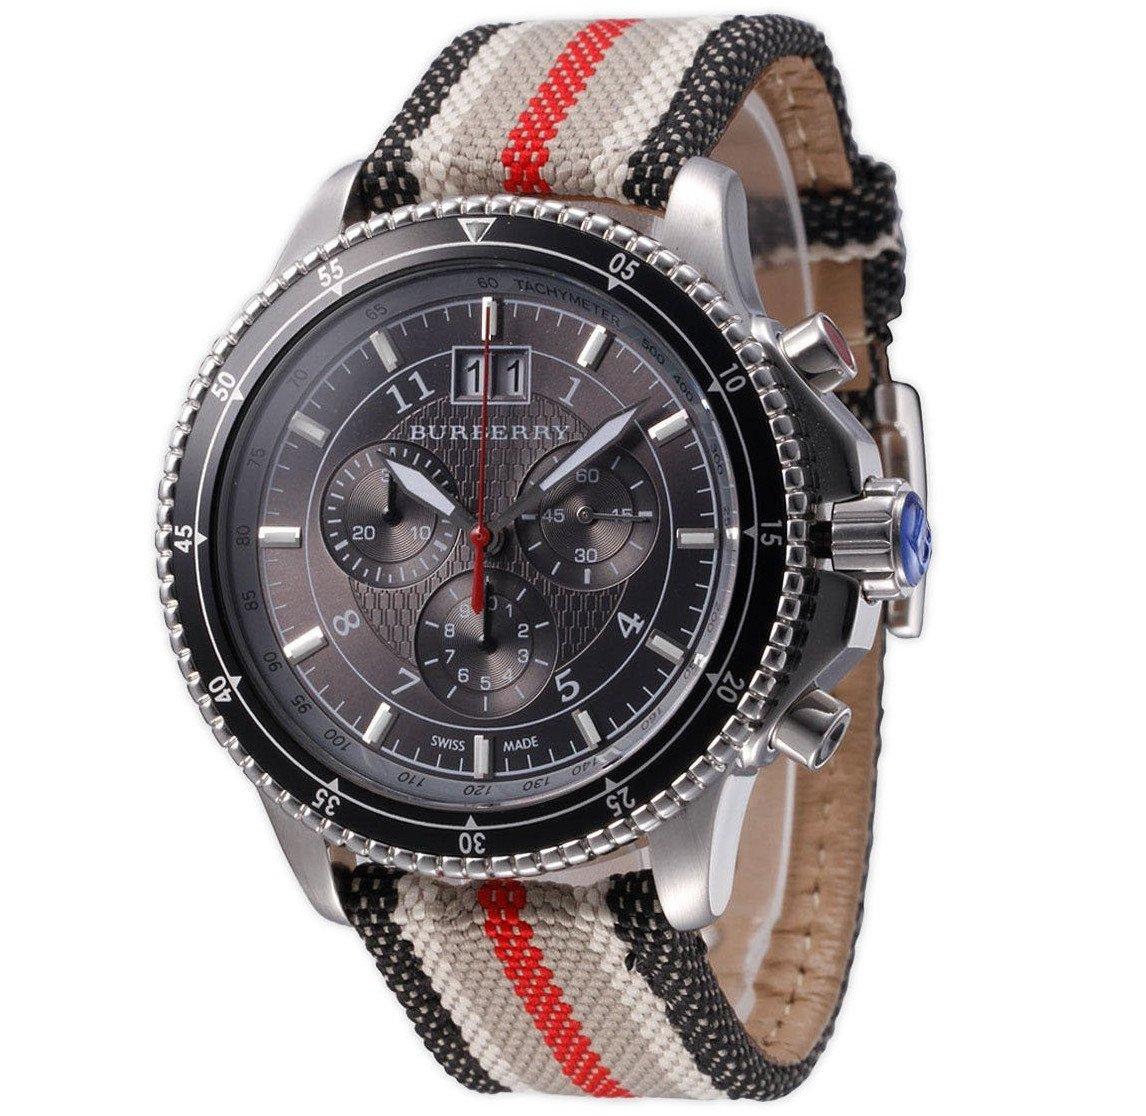 Burberry Endurance Bu7601 Black Chronograph Men's Watch by BURBERRY (Image #1)